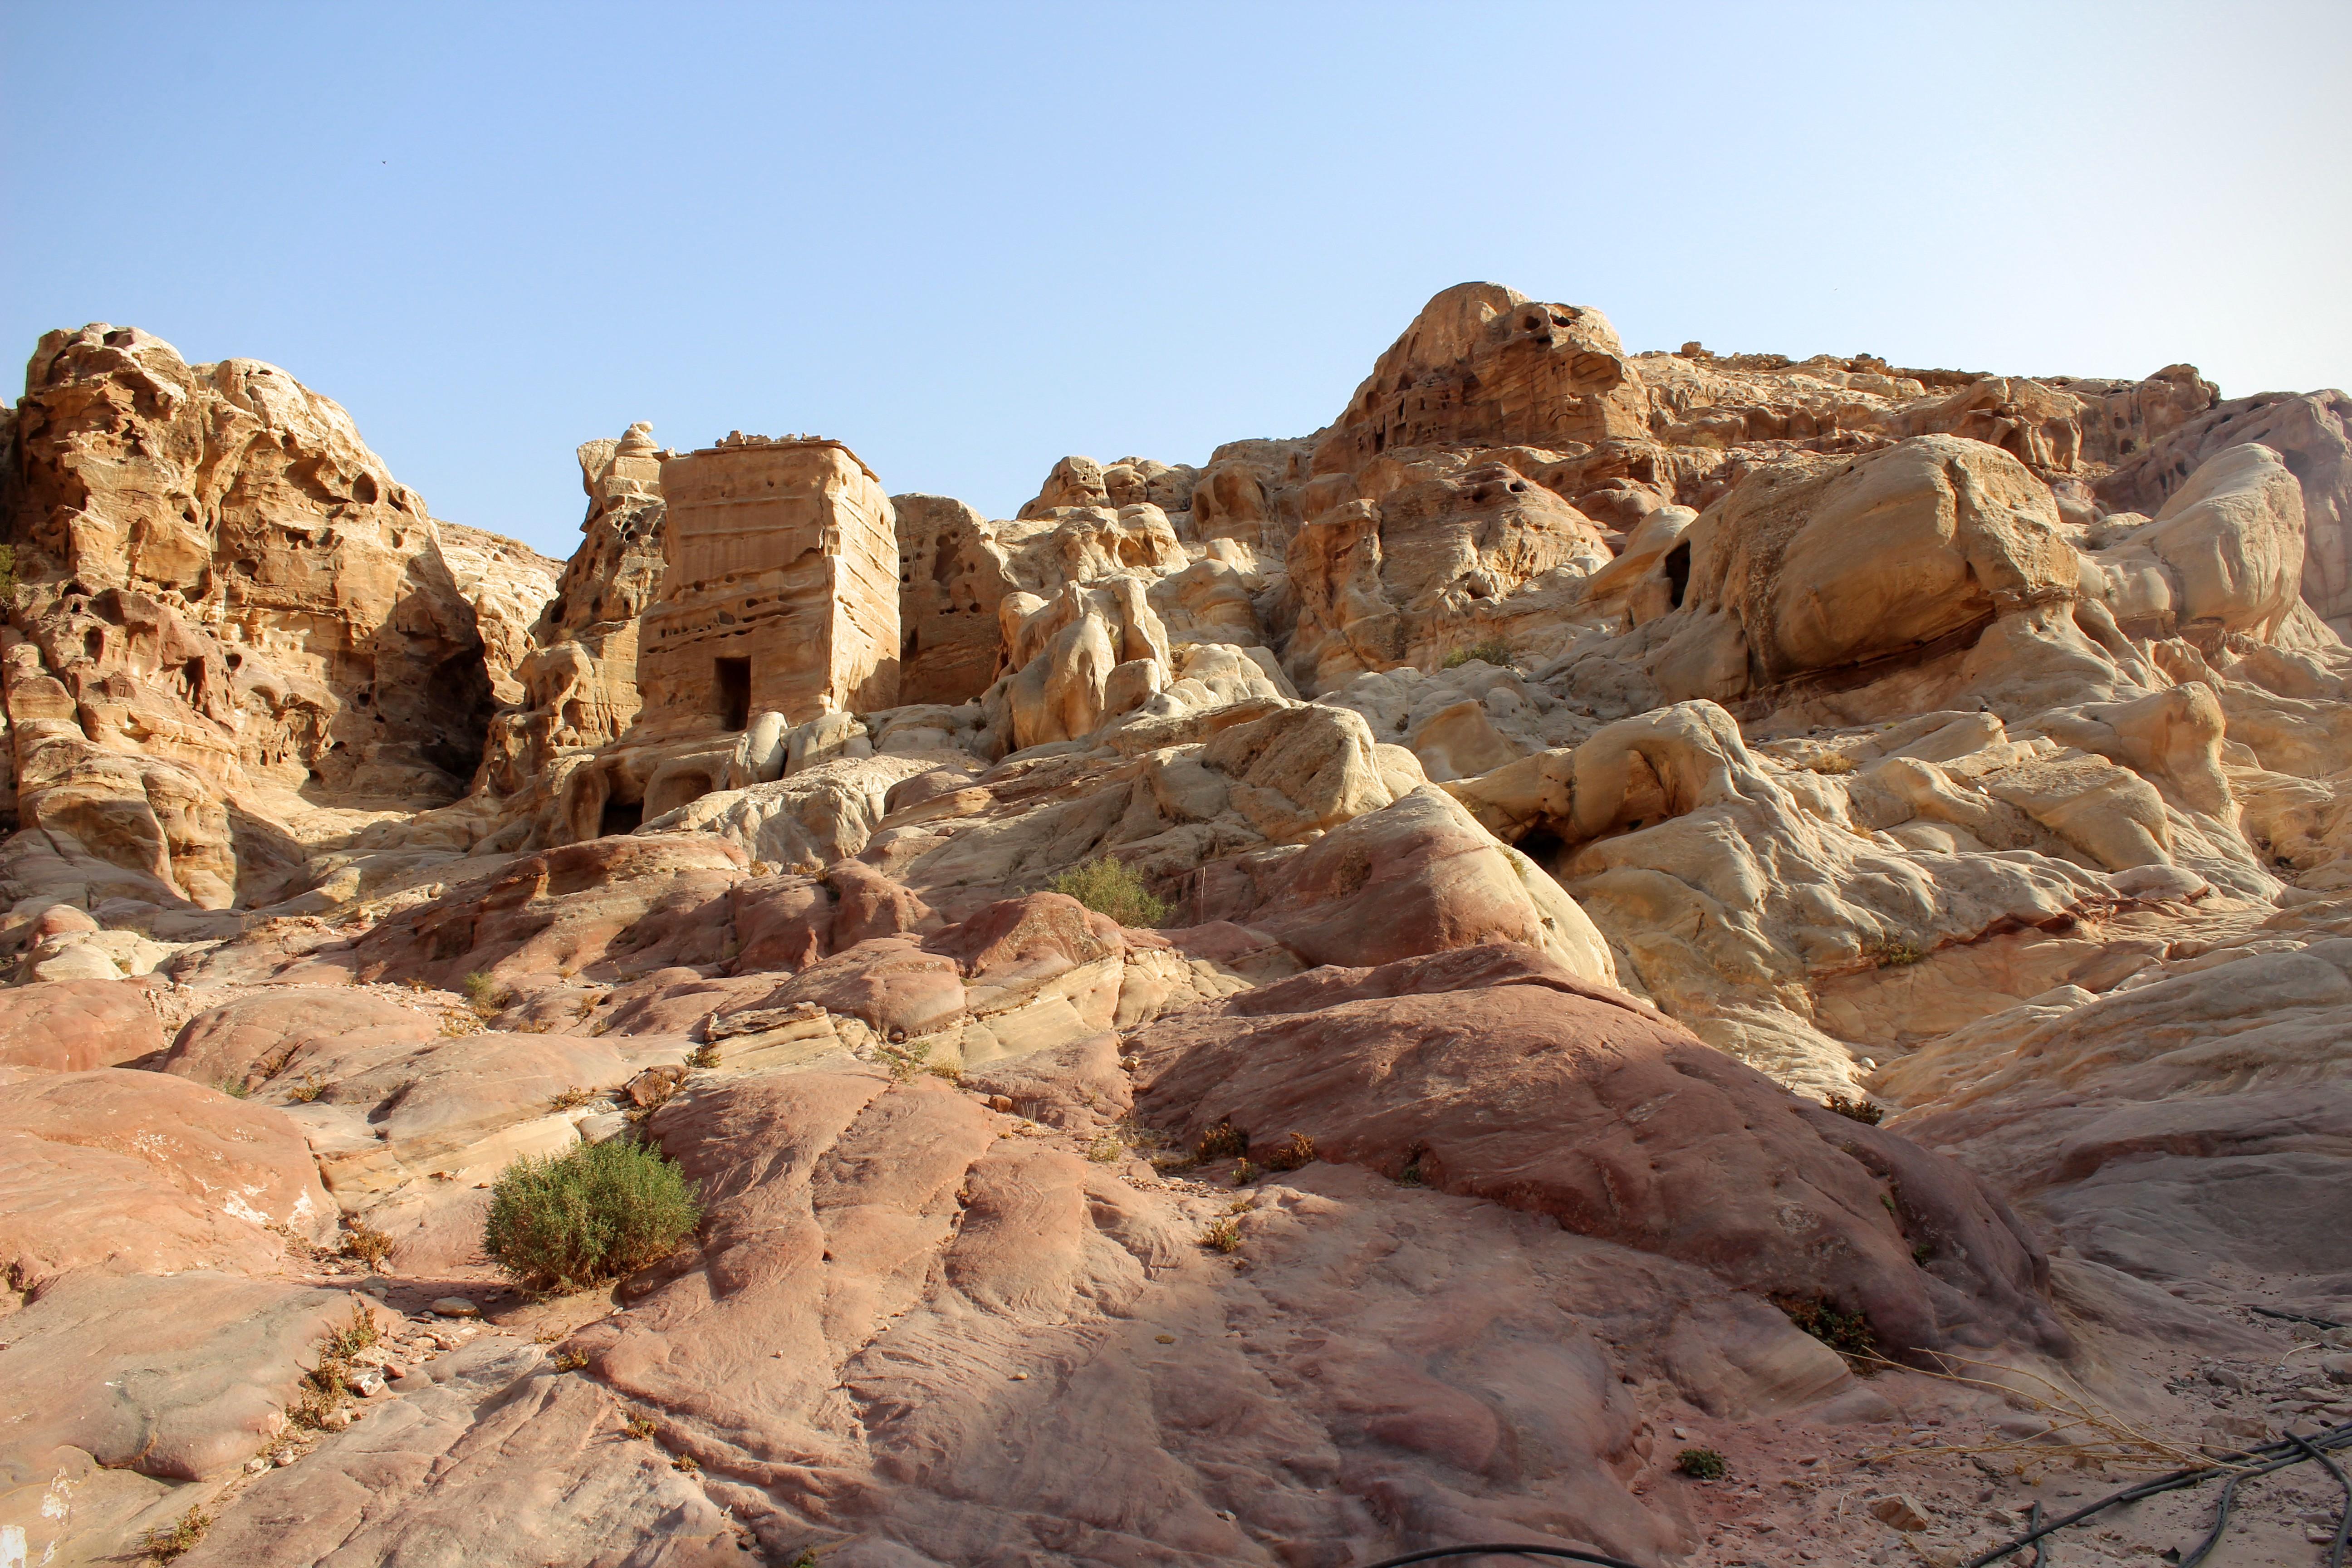 Nabataean burial tombs